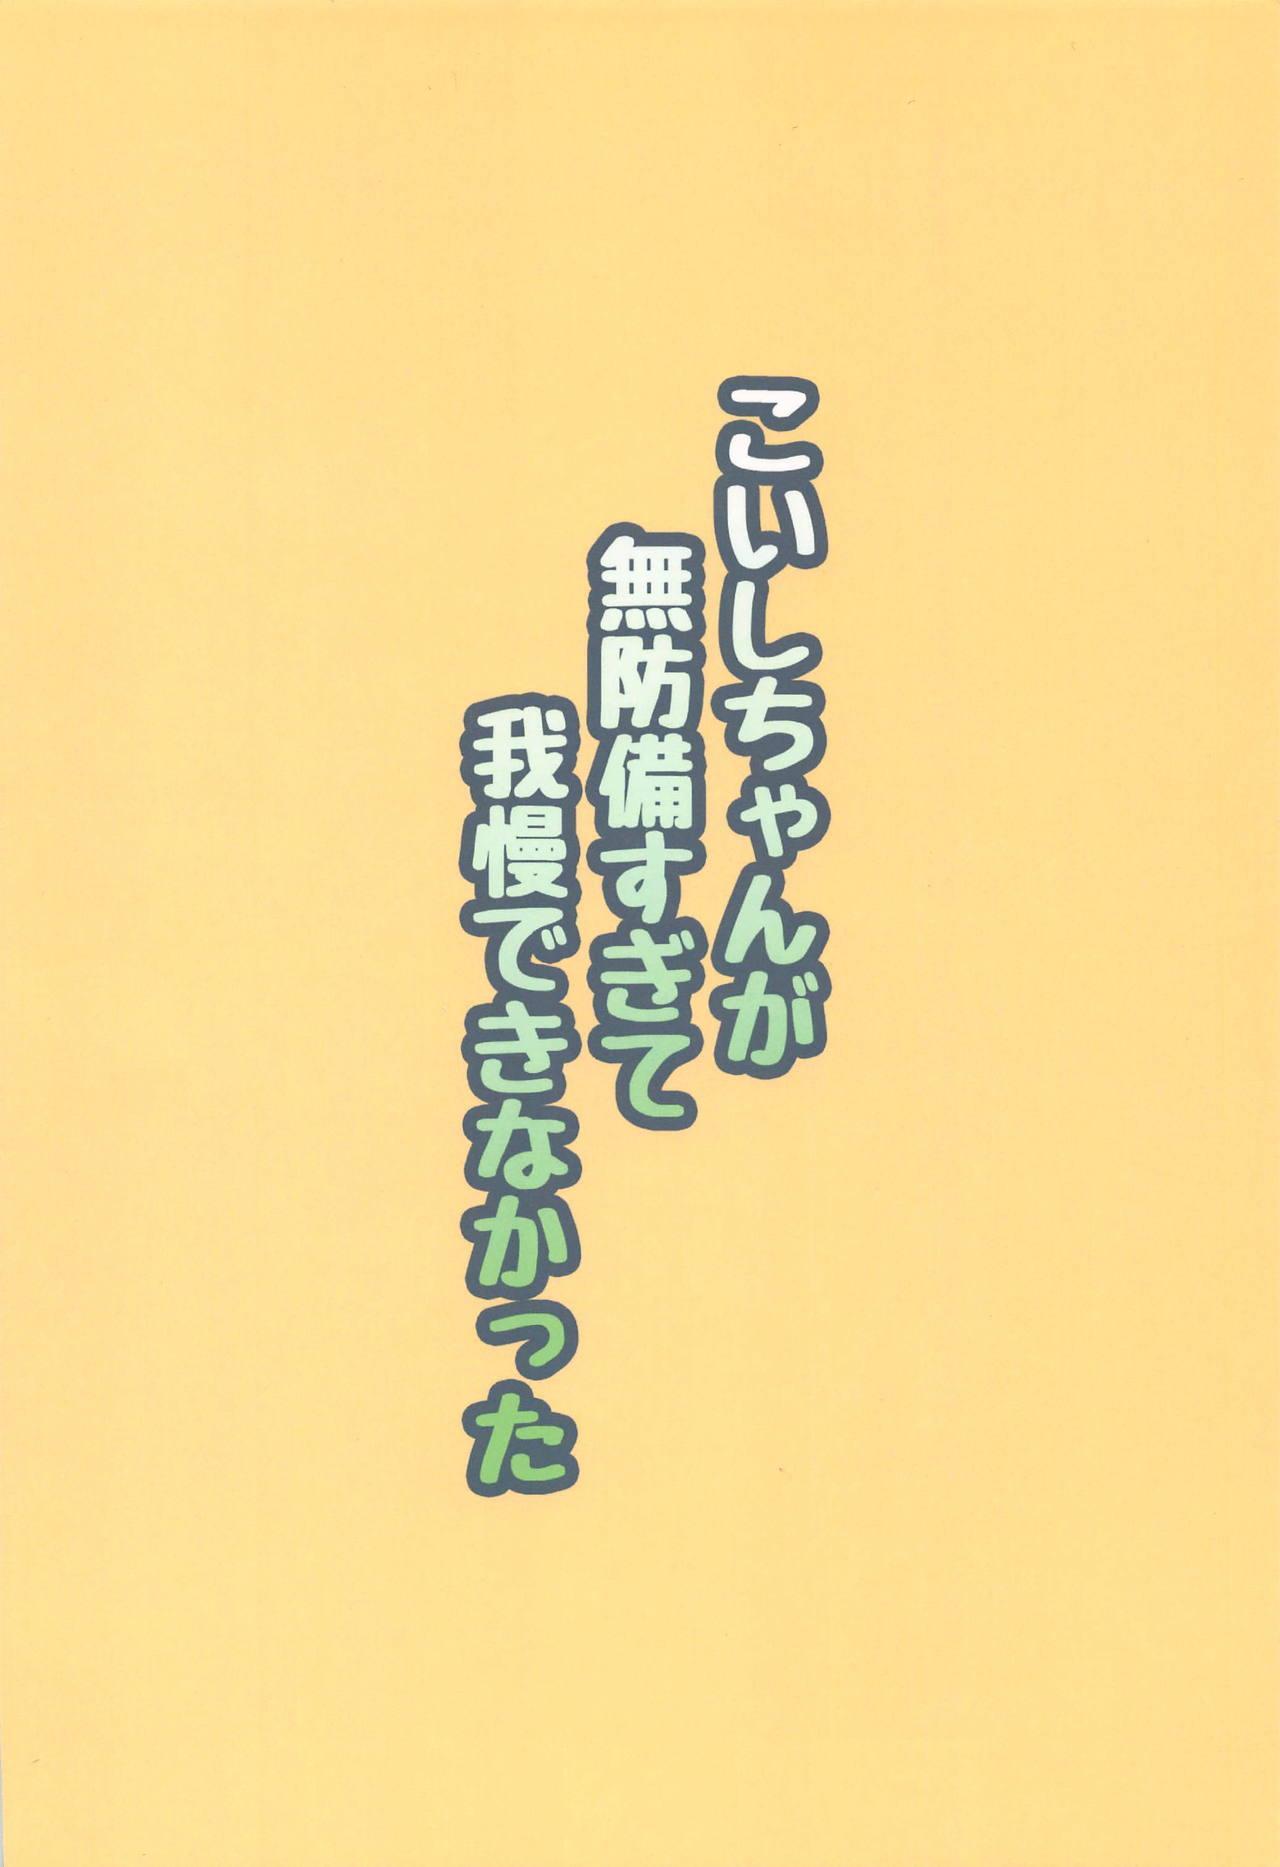 Koishi-chan ga Muboubi Sugite Gaman Dekinakatta 19